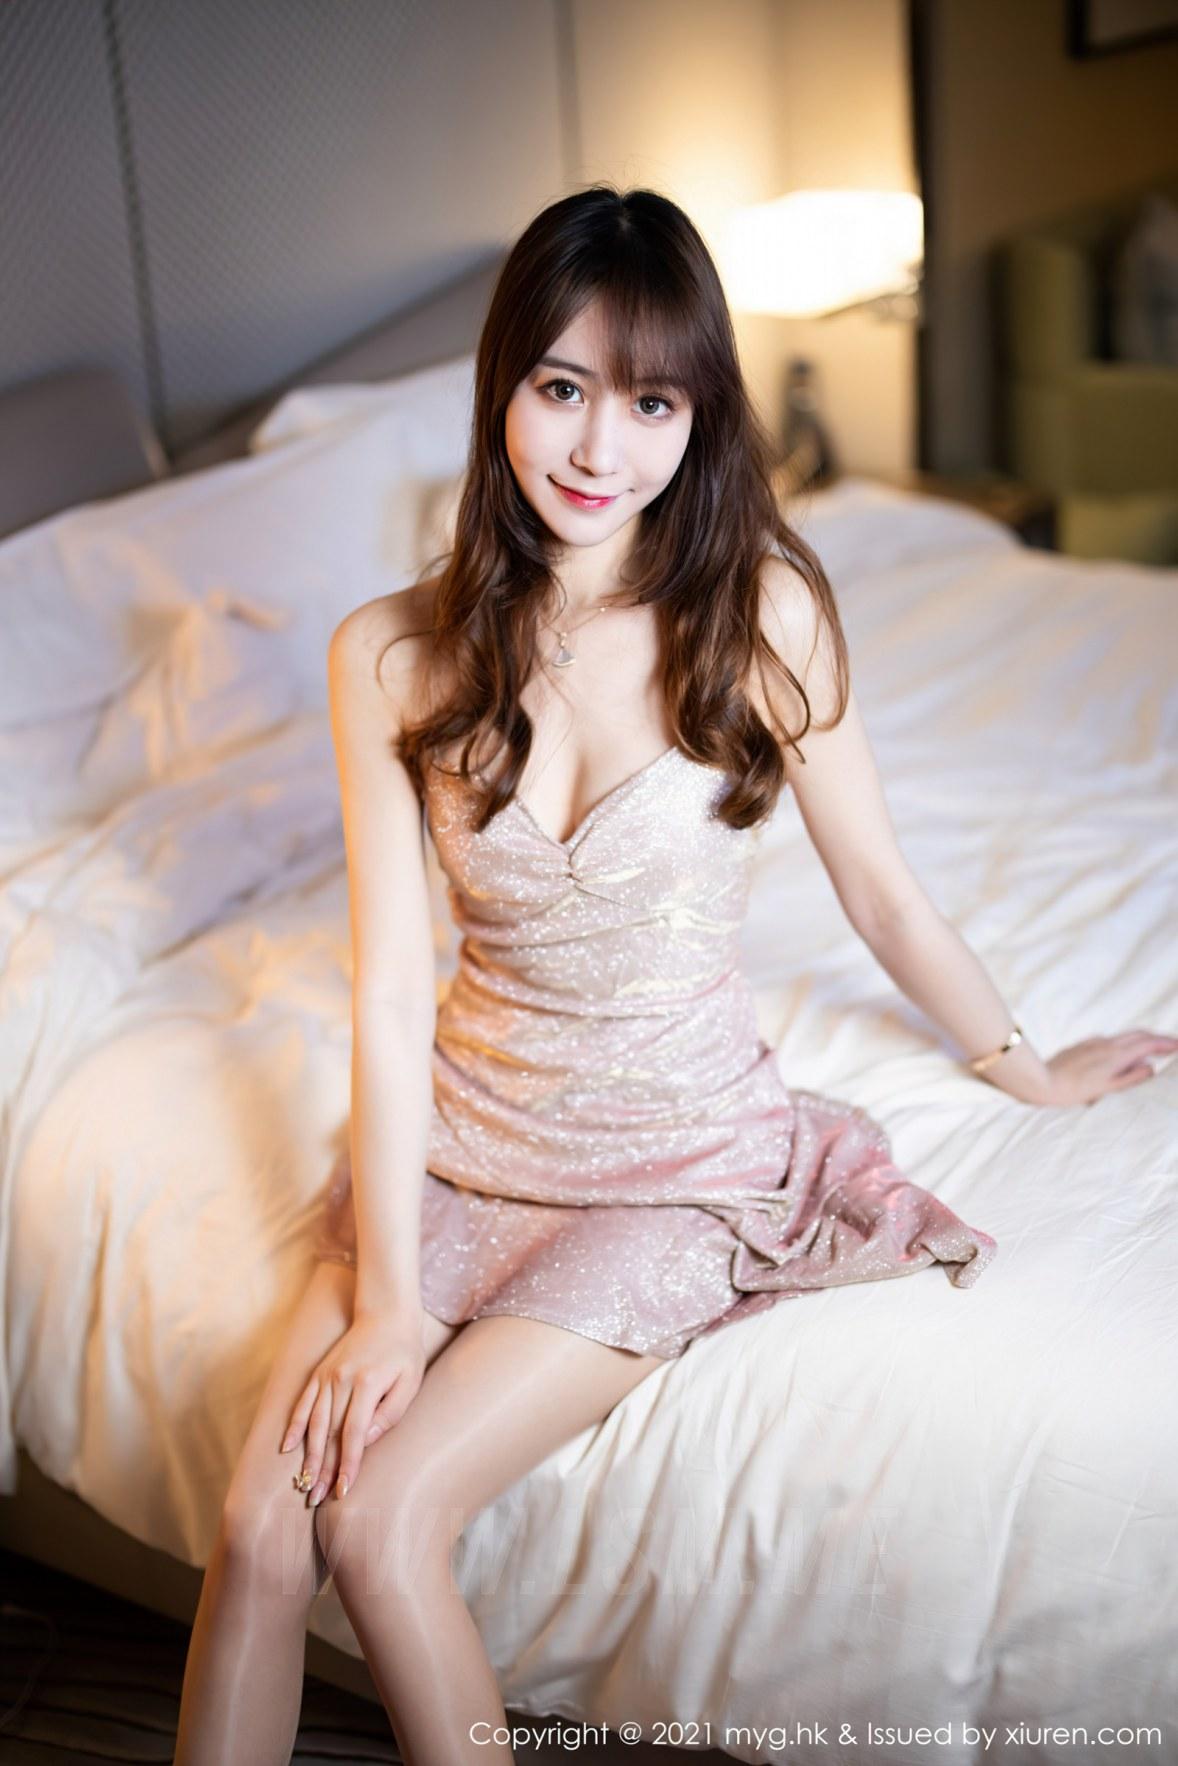 MyGirl 美媛馆 Vol.577 吊裙与丝袜 水水er 性感写真11 - 3